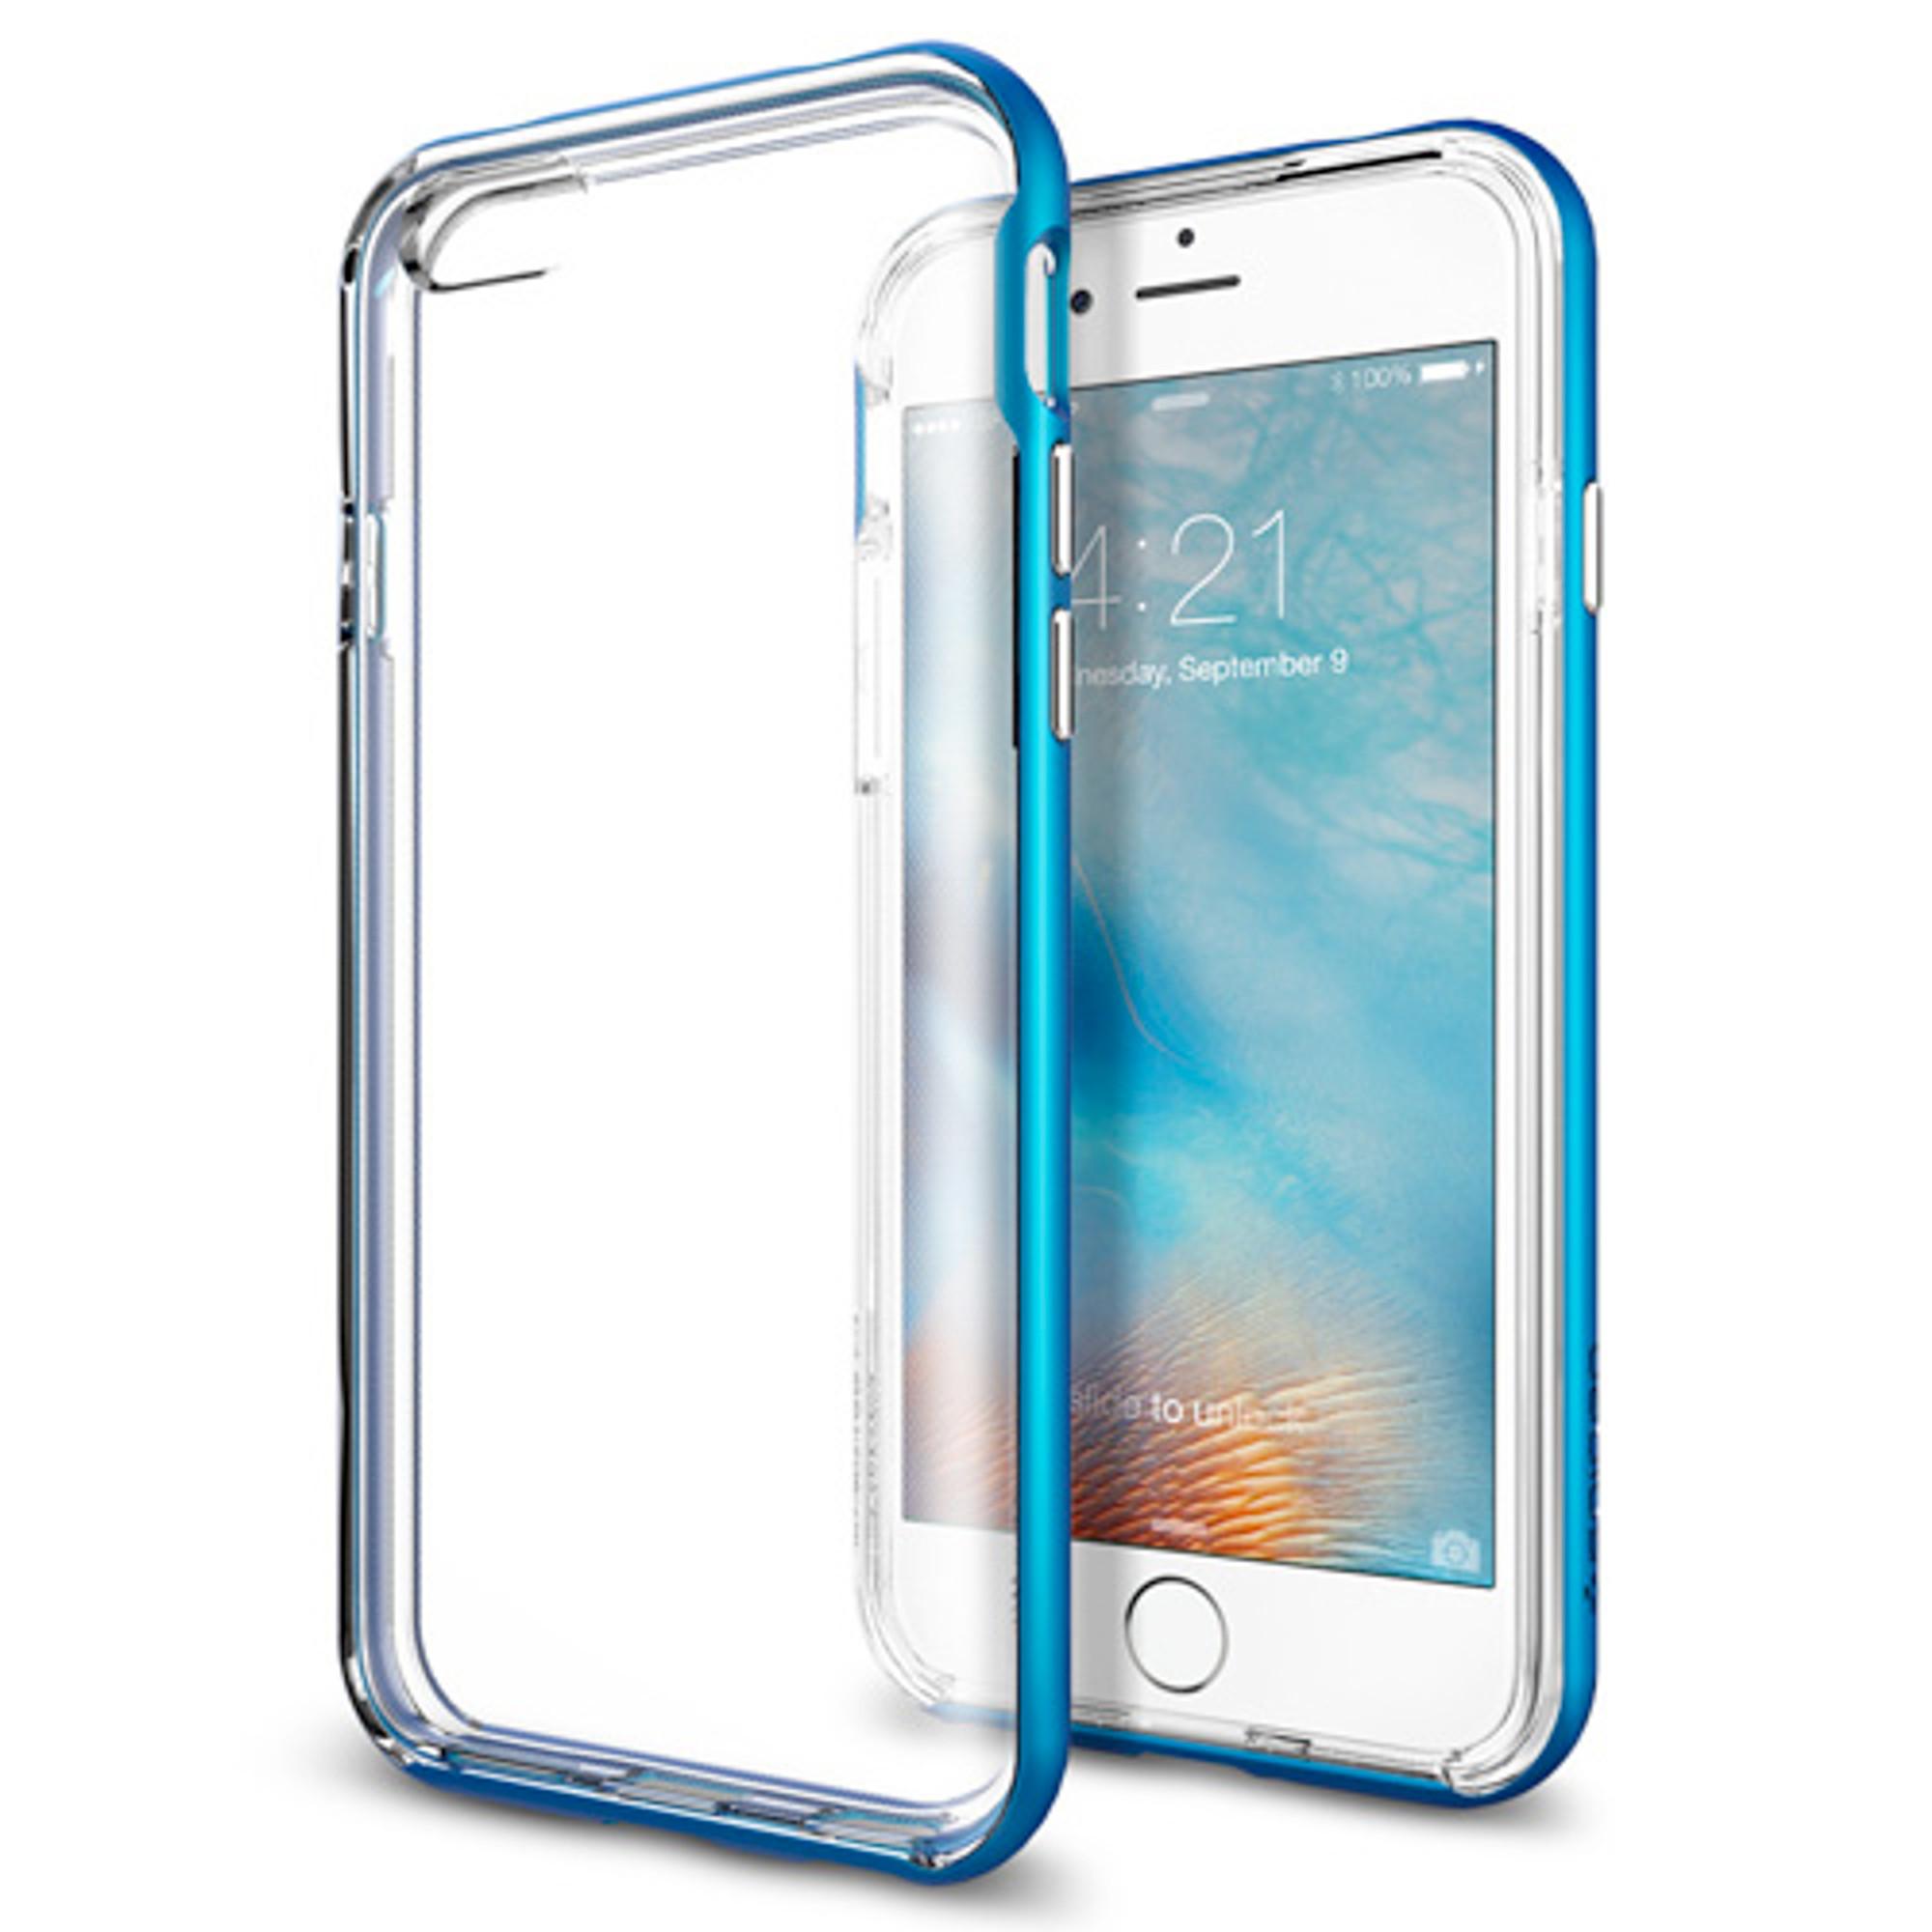 the latest 81137 163ee Spigen Neo Hybrid EX iPhone 6S / 6 Case - Electric Blue